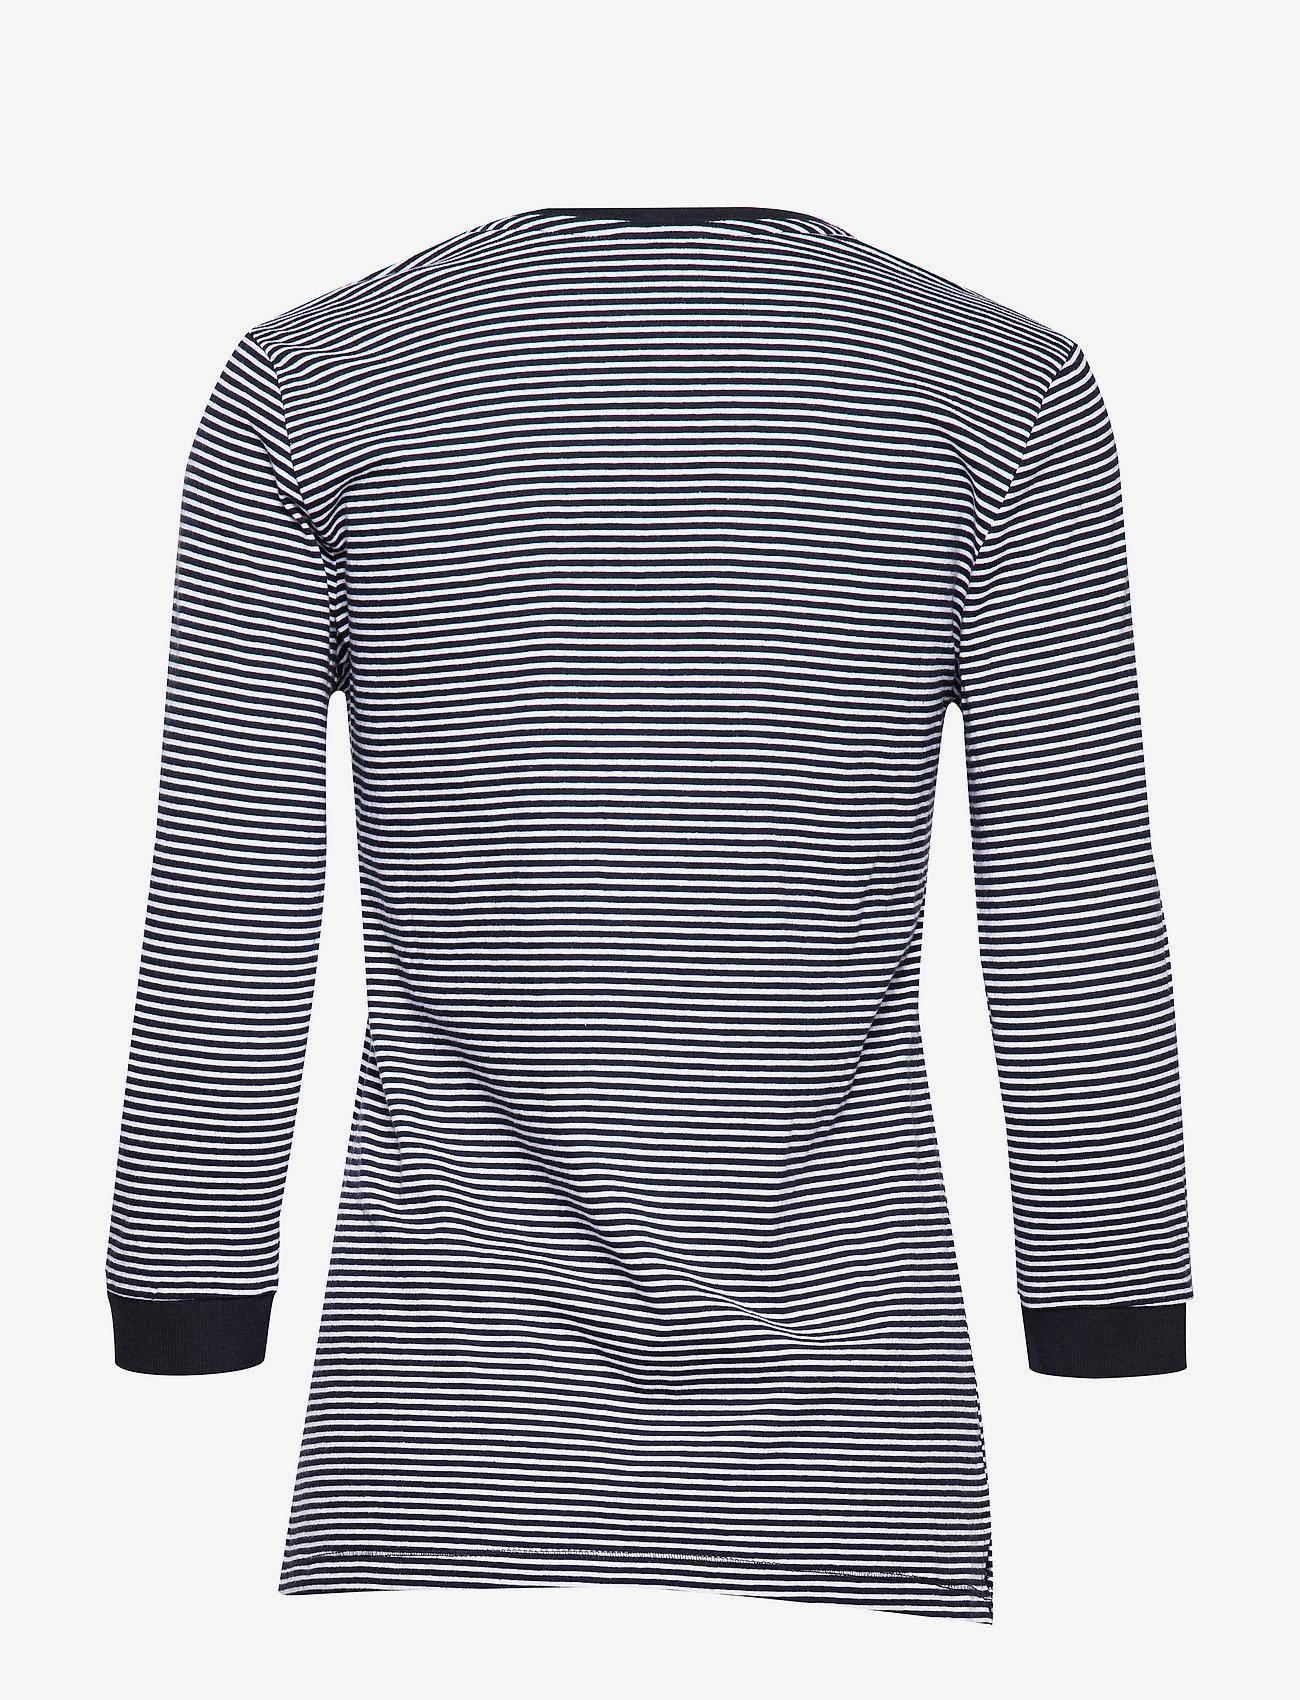 Esprit Bodywear Women - Pyjamas - tops - navy - 1